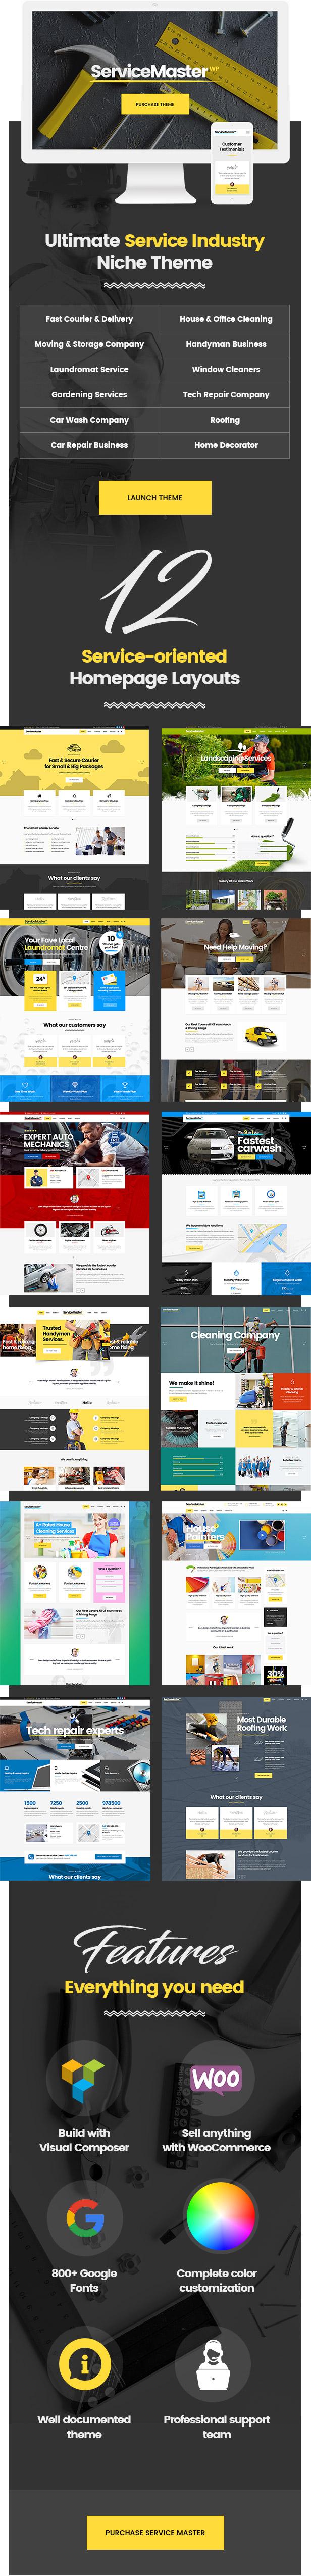 Service Master - Multi-Concept Theme for Service Businesses - 1